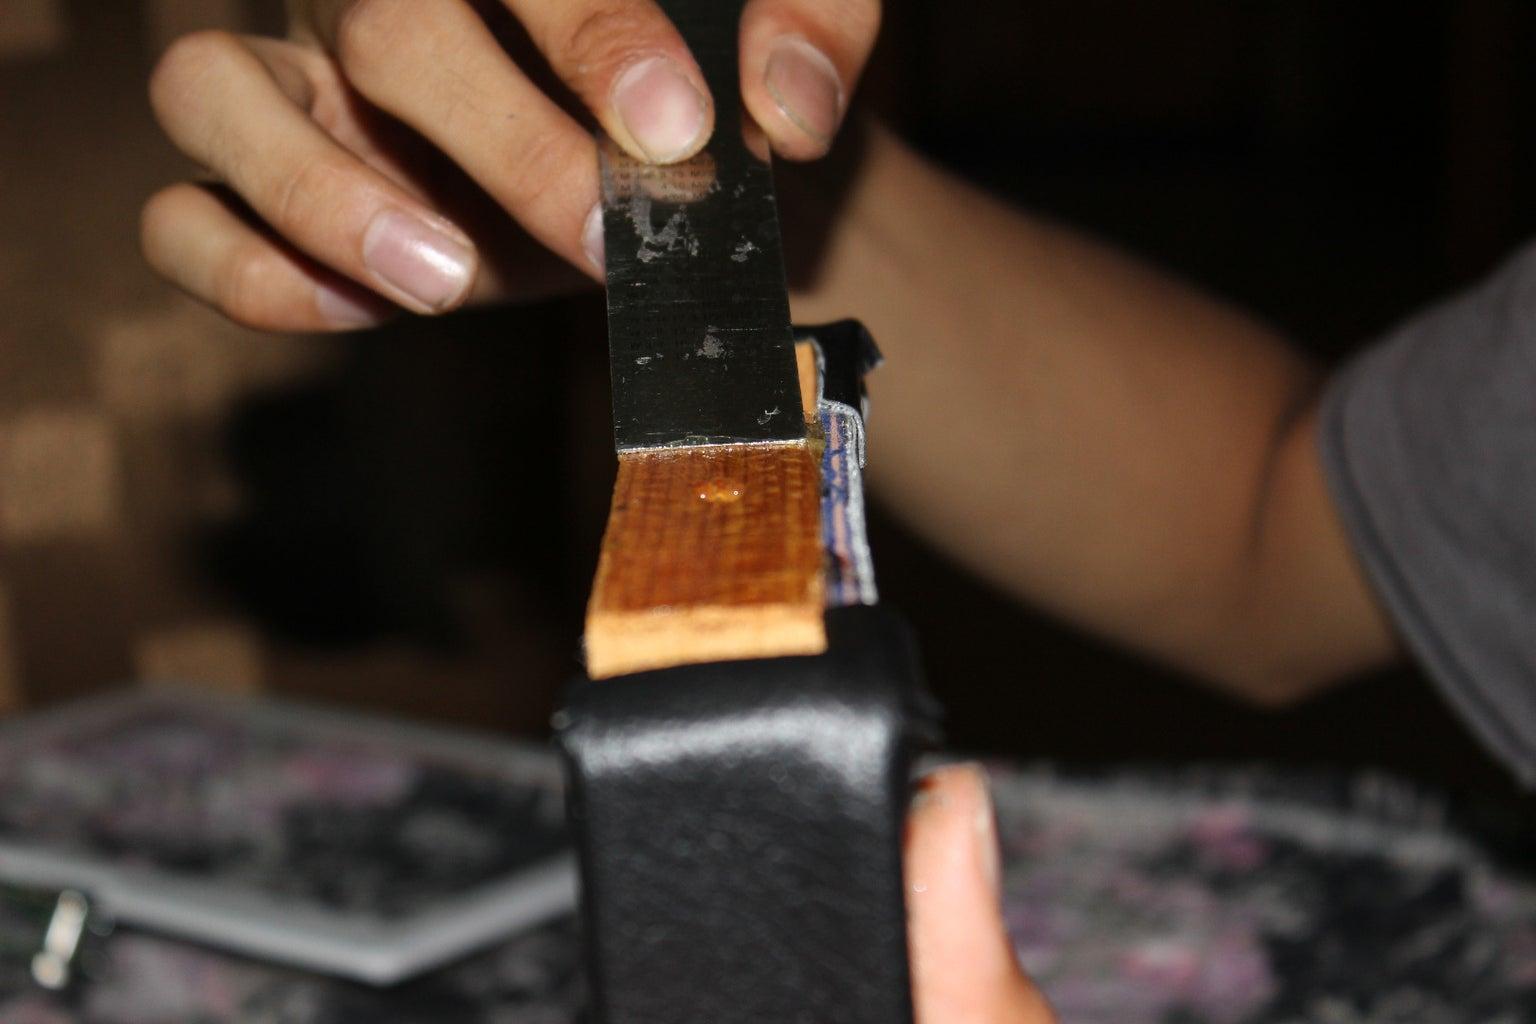 Some Leatherworking....